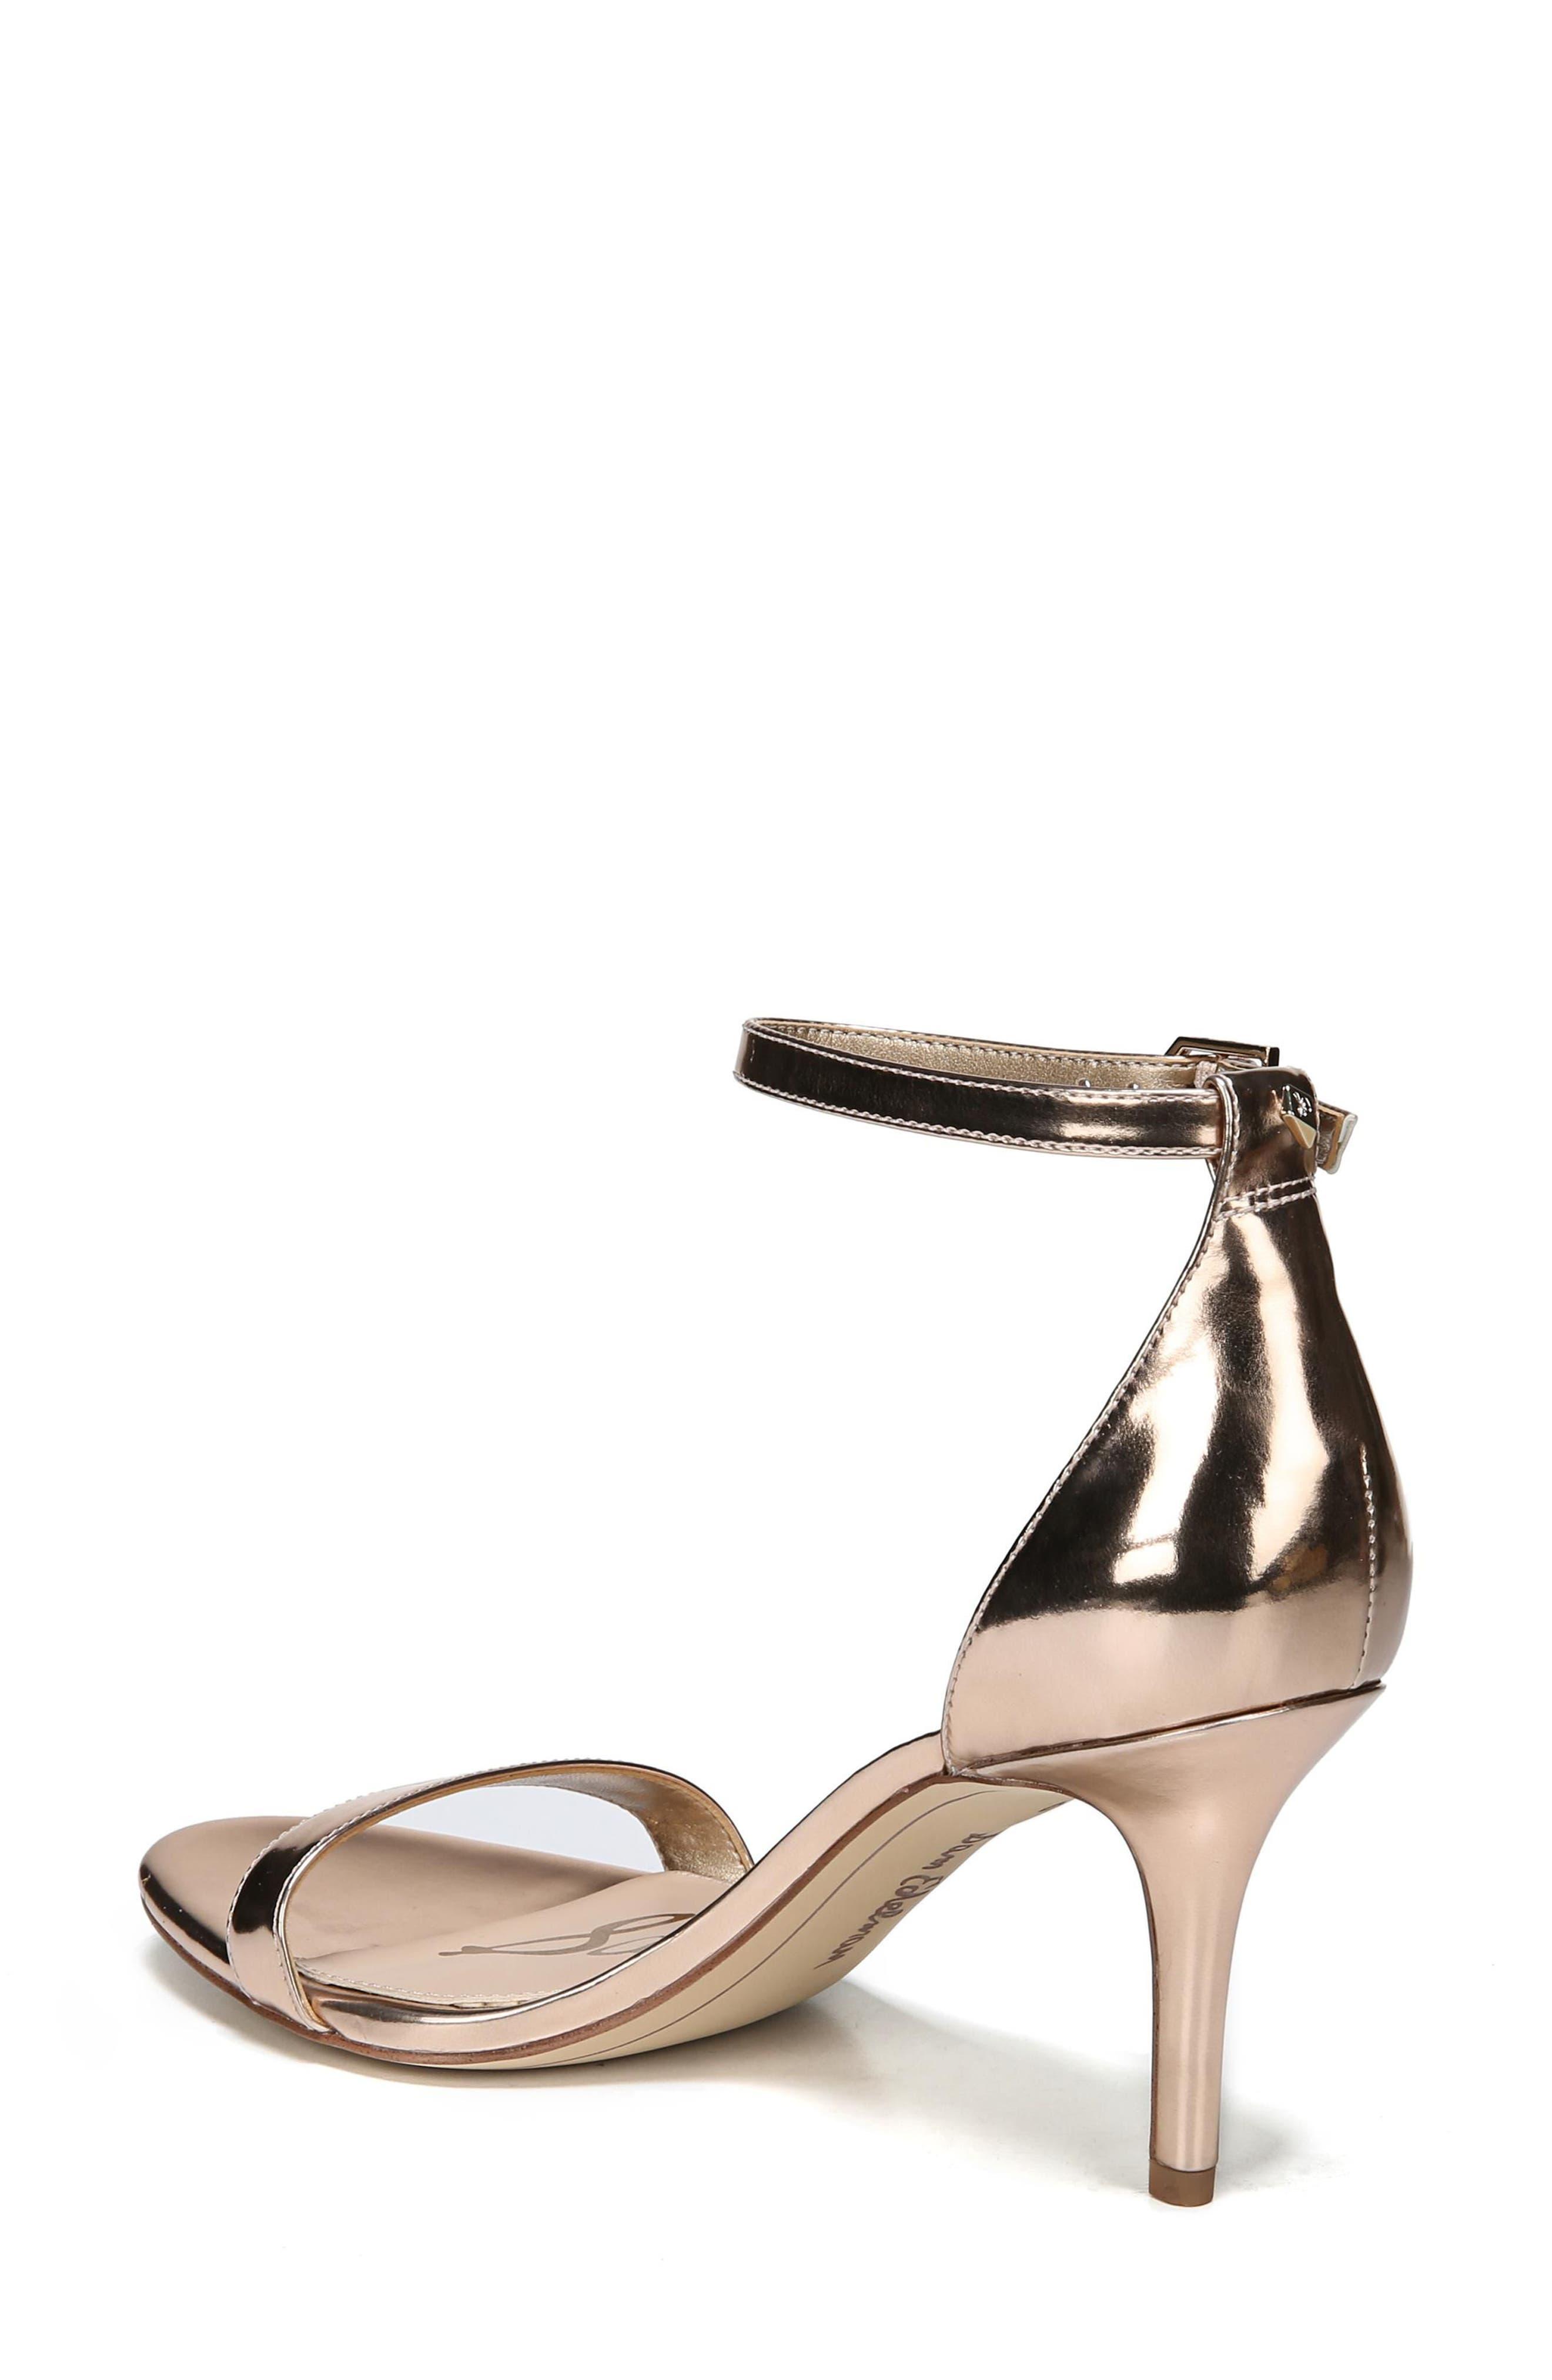 ,                             'Patti' Ankle Strap Sandal,                             Alternate thumbnail 123, color,                             650